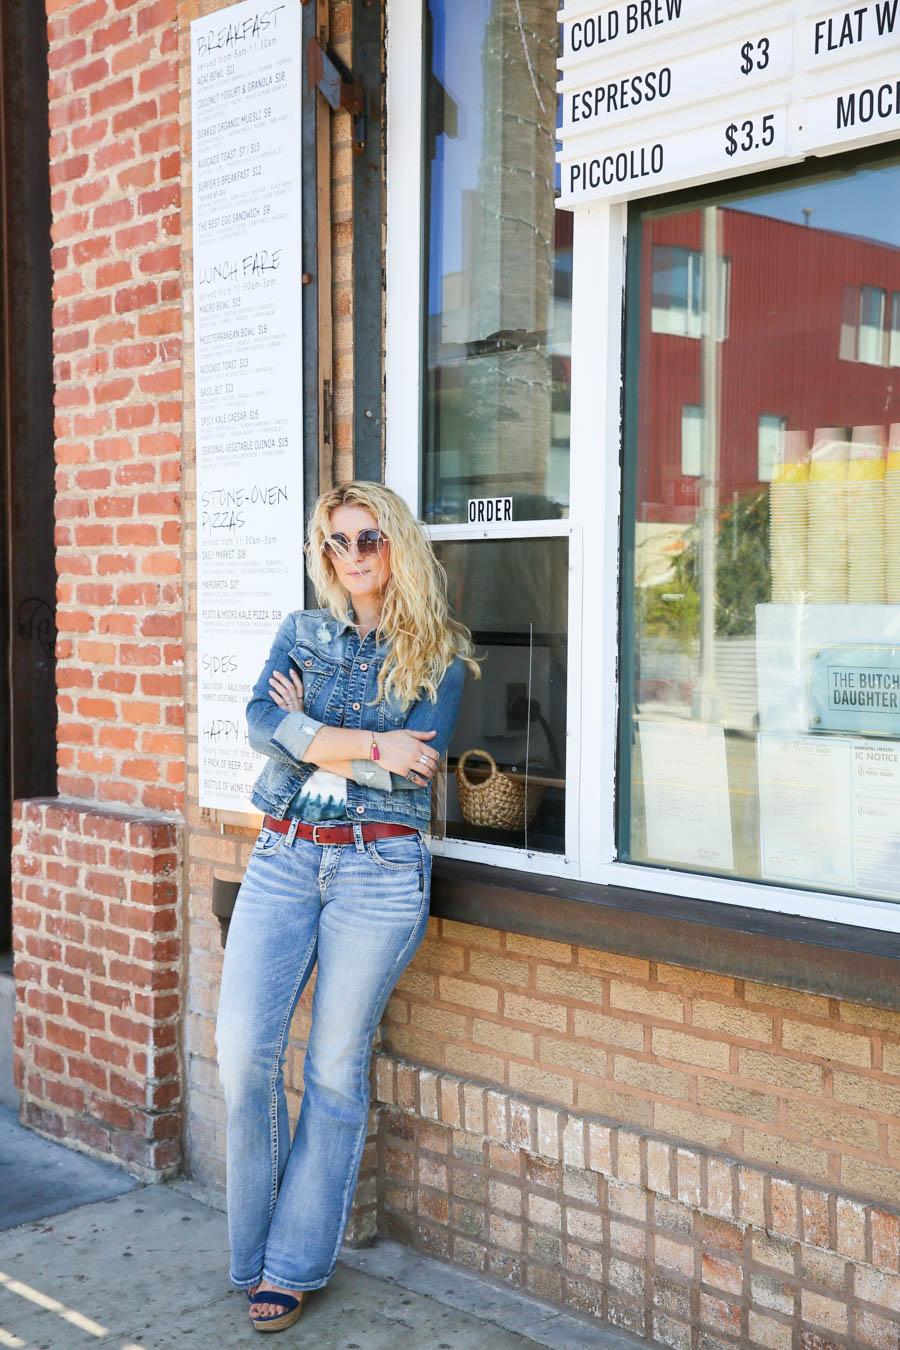 80s Baby | 70s Lady | How to Wear Flare Jeans | How to Wear Denim Jeans + Jacket | LA Women's Denim Fashion Blogger